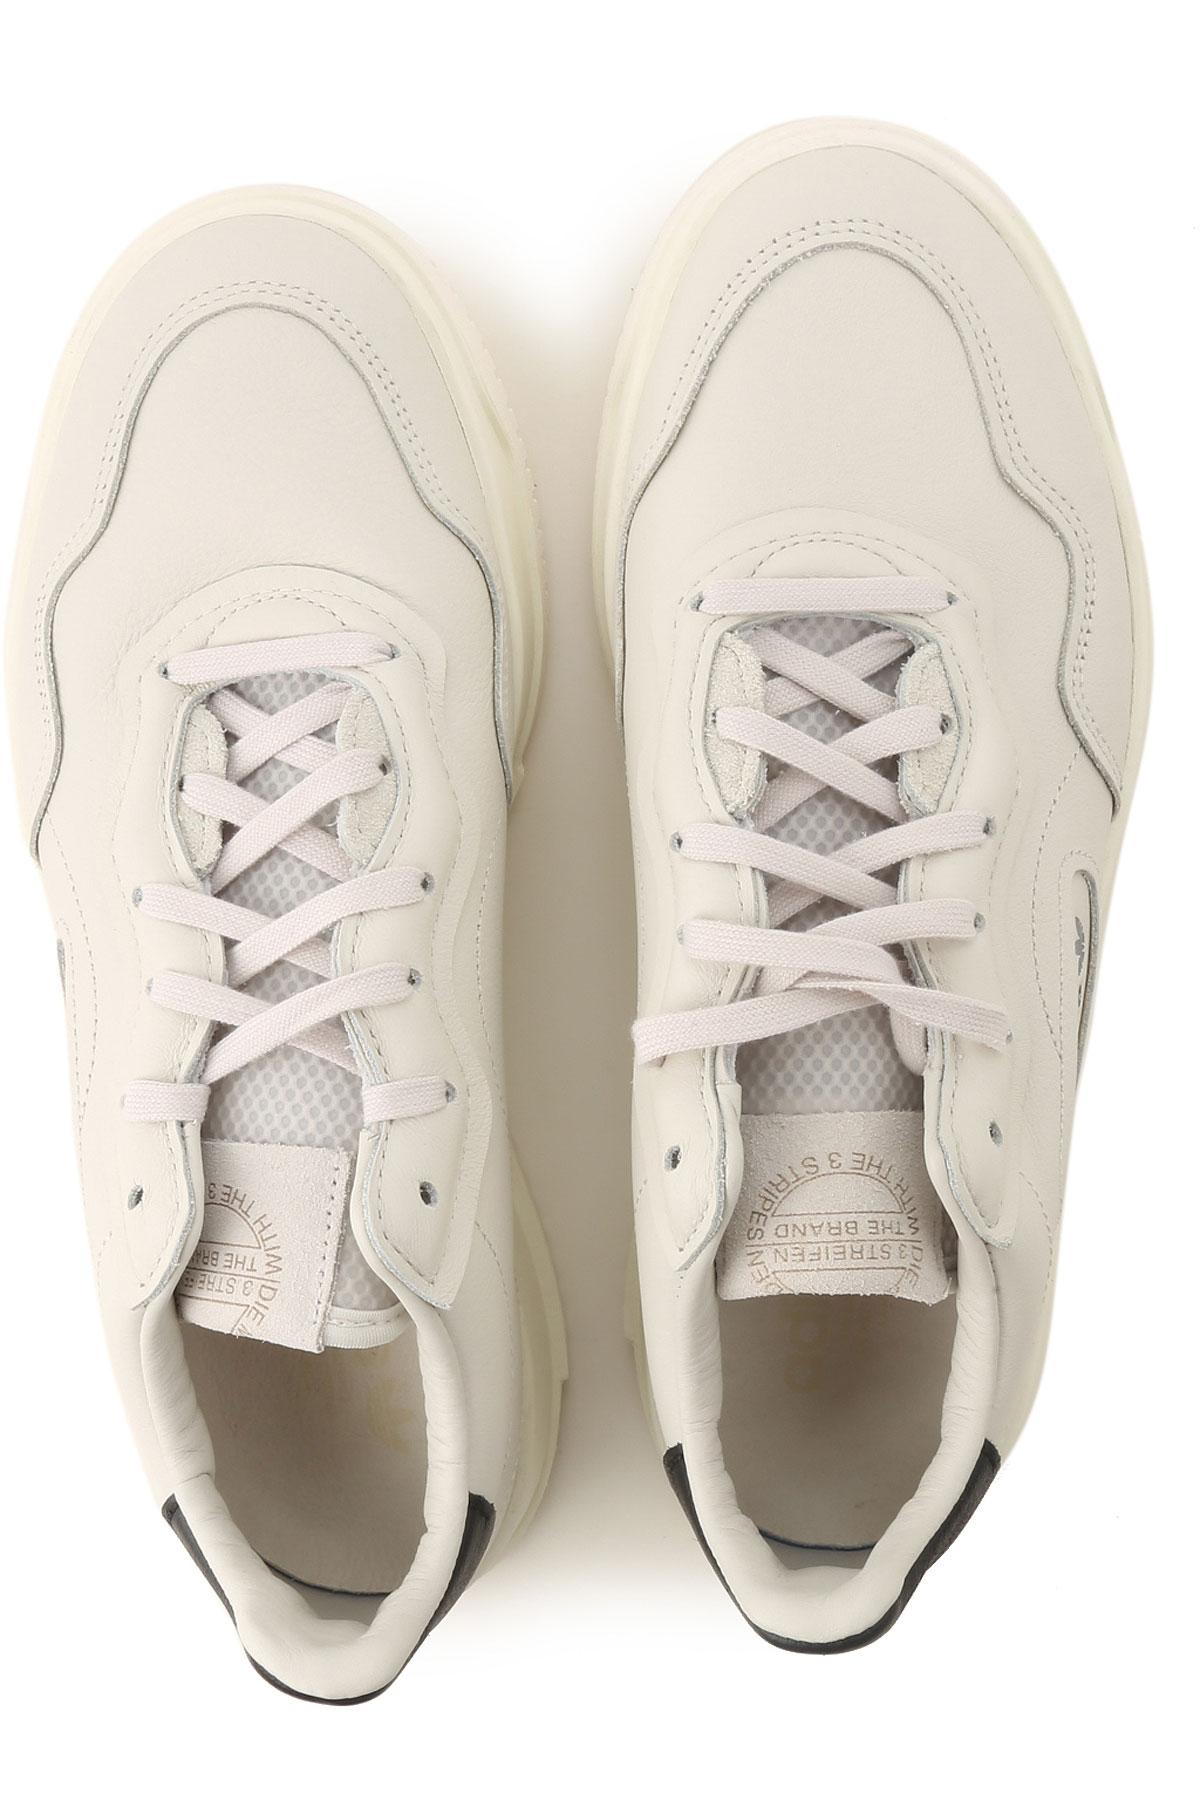 Blanco Hombres Para Adidas verano Crudo Zapatos Primavera 2019 Negro C6YwqFwx